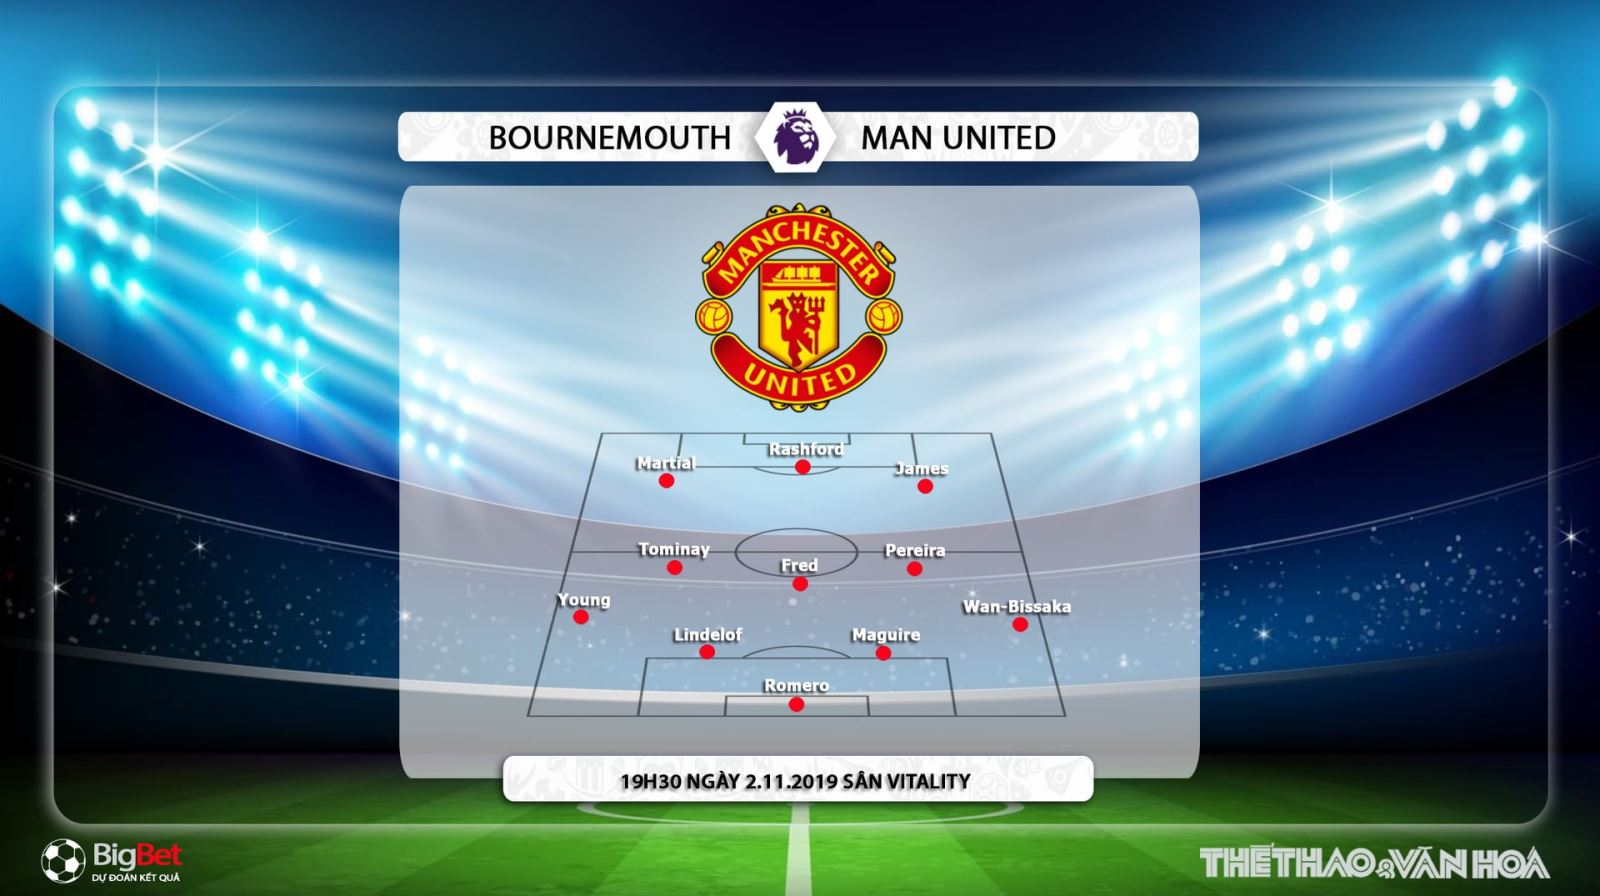 MU, Man Utd, Manchester United, Bournemouth đấu với Man Utd, MU vs Bournemouth, Bournemouth vs Man Utd, MU đấu với Bournemouth, Man Utd đấu với Bournemouth